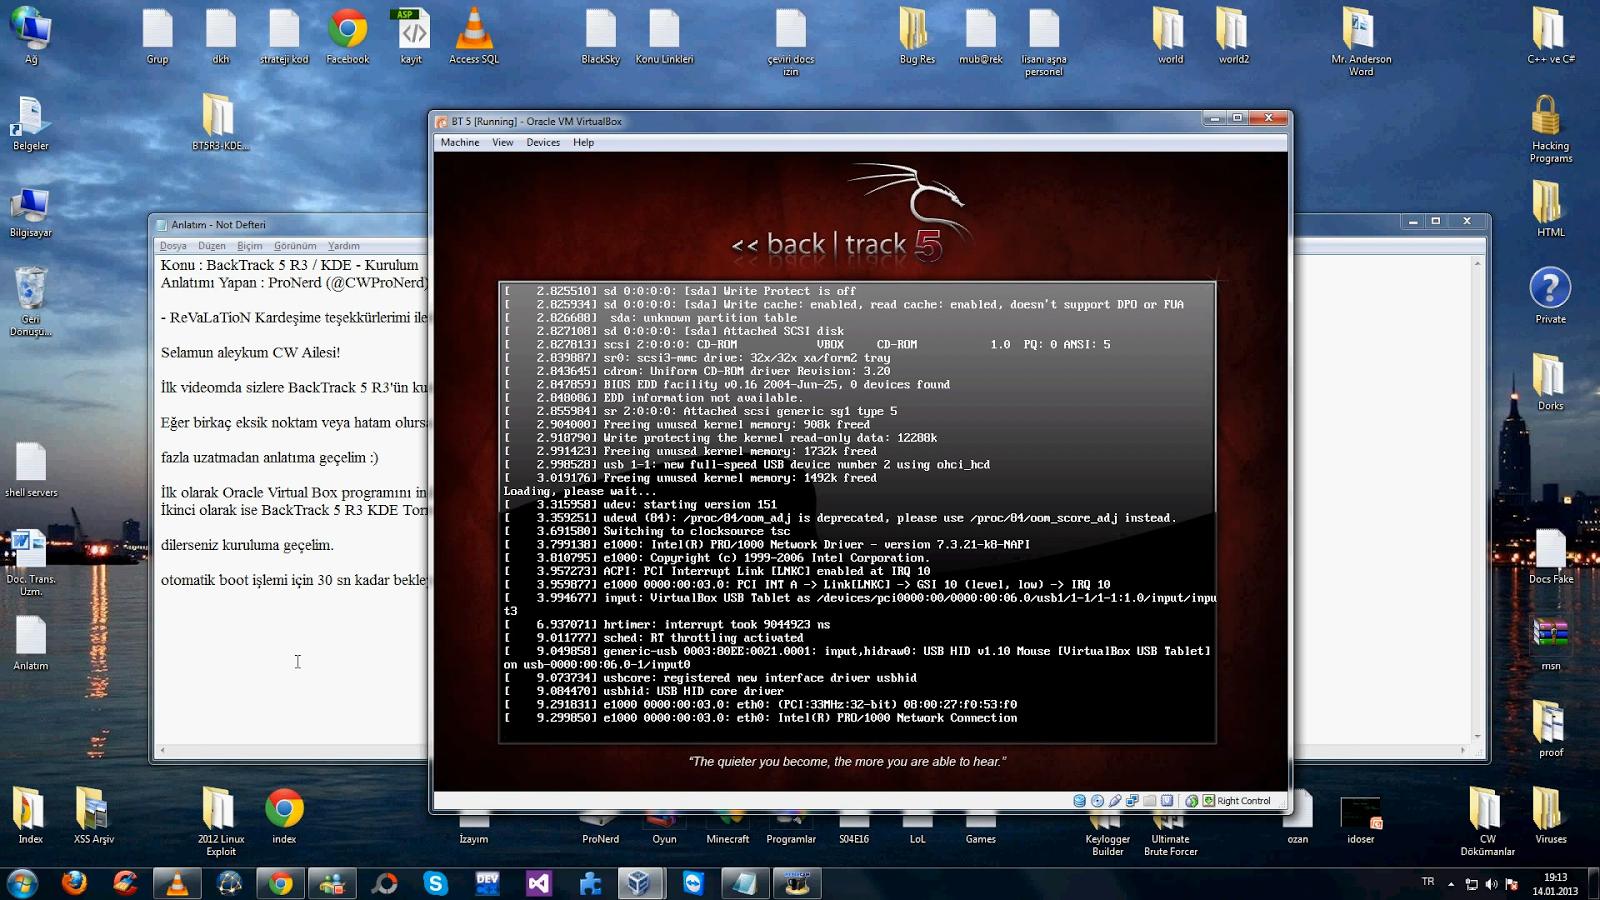 Backtrack 5 r2 gnome disk usage